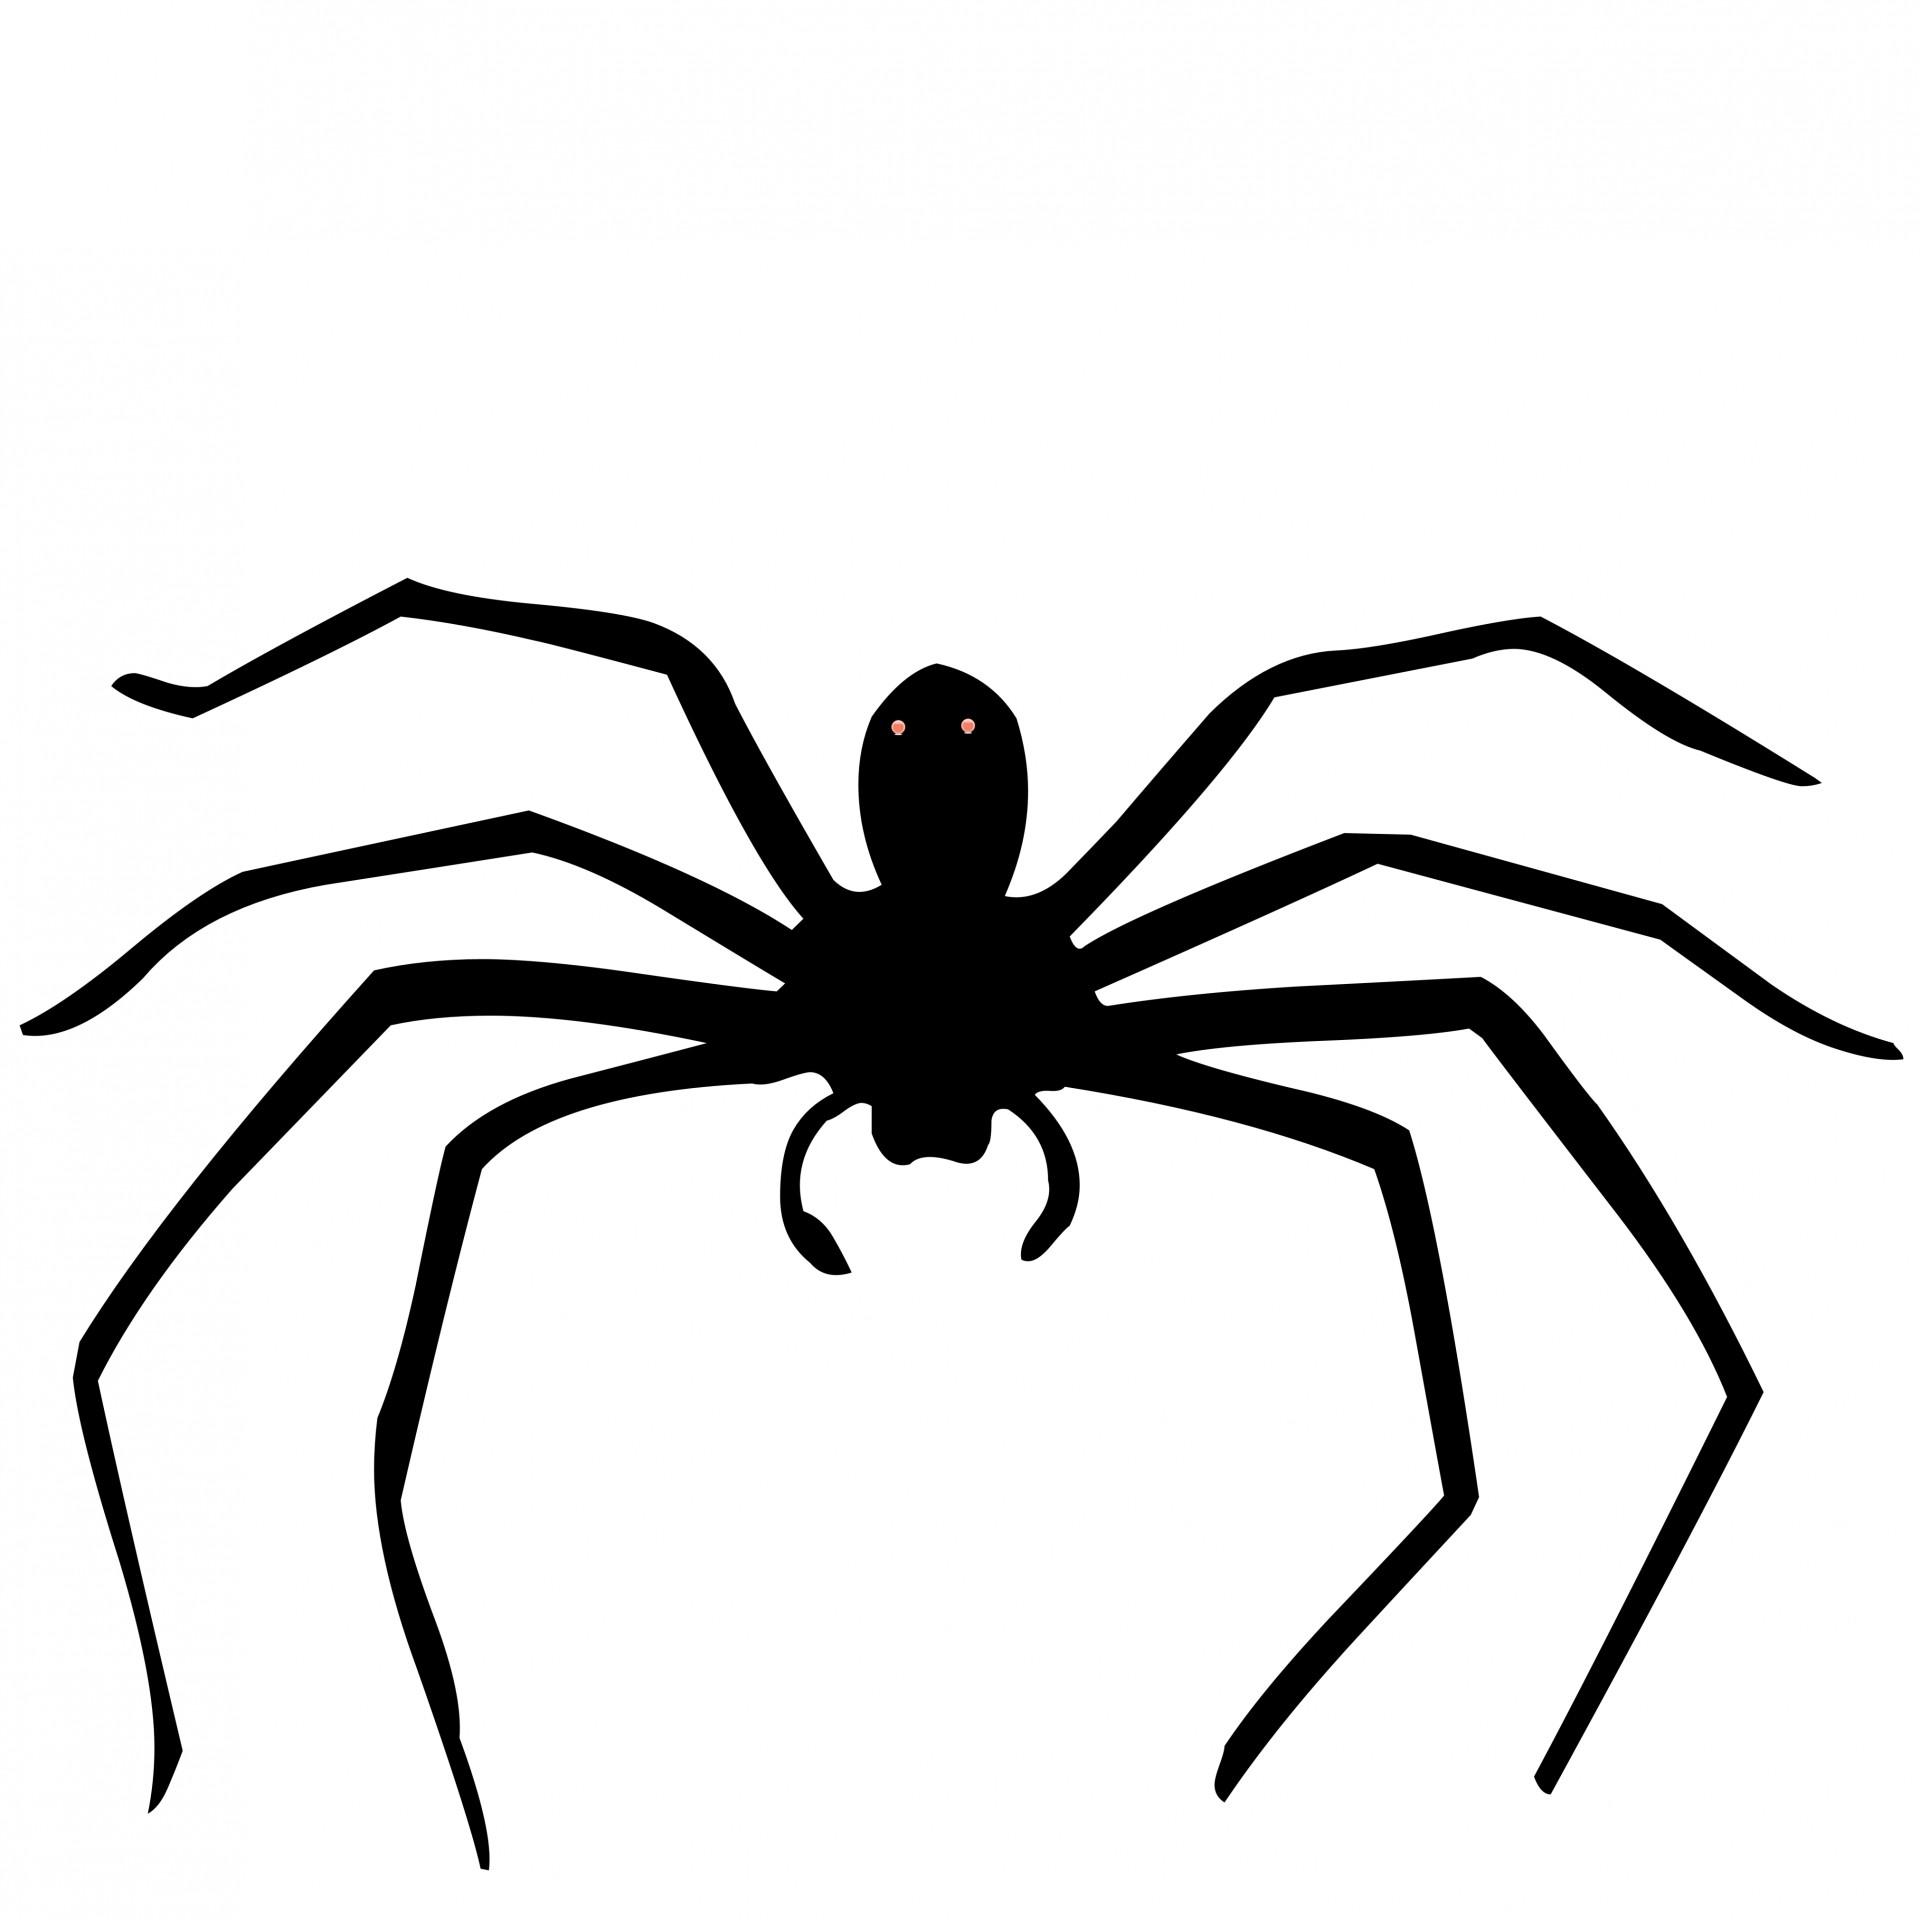 Spider Free Stock Photo